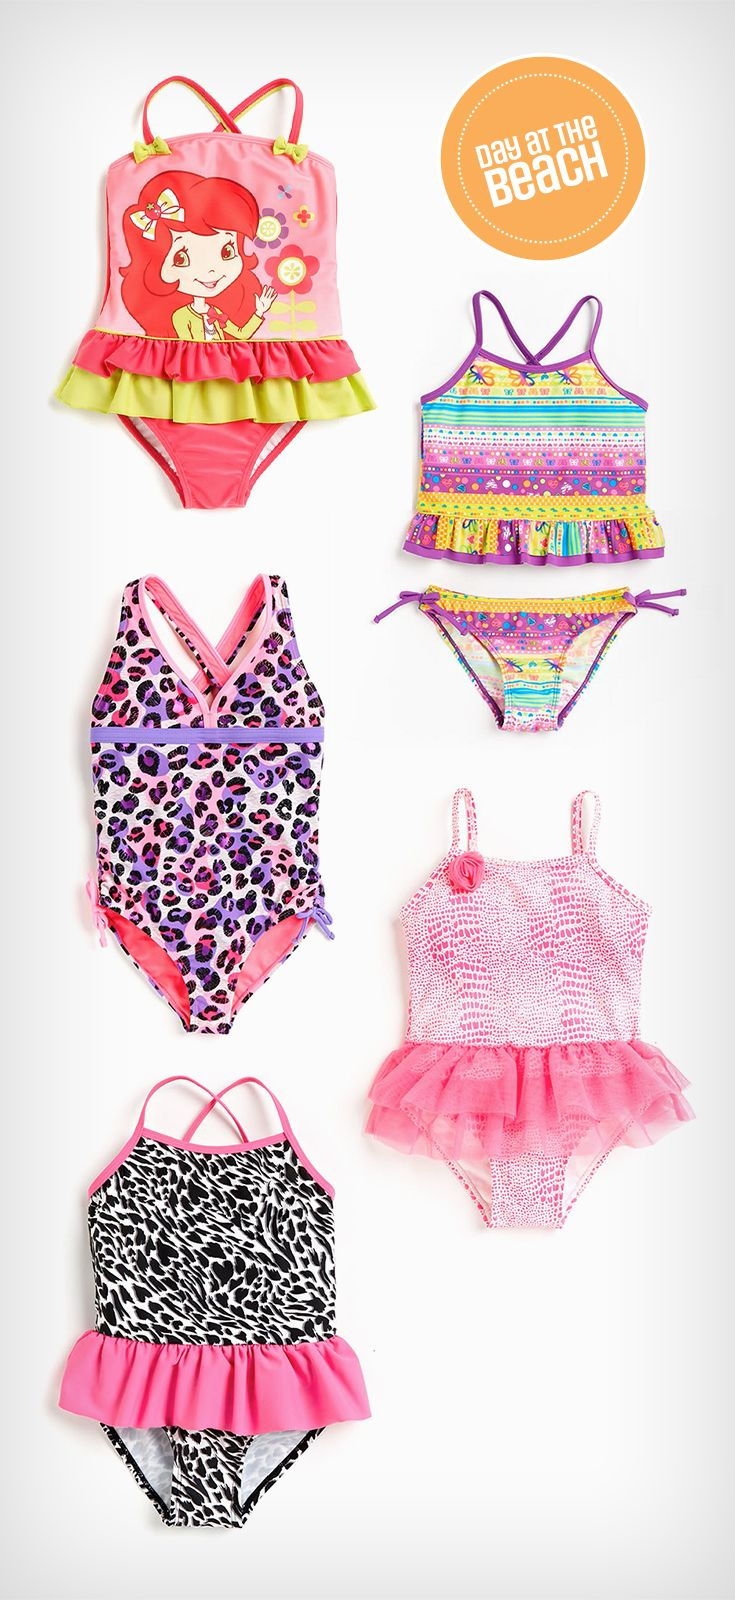 93bf0d5f5f4ad Make a splash in kids  swim fashion  Girl s 1-piece swimsuit